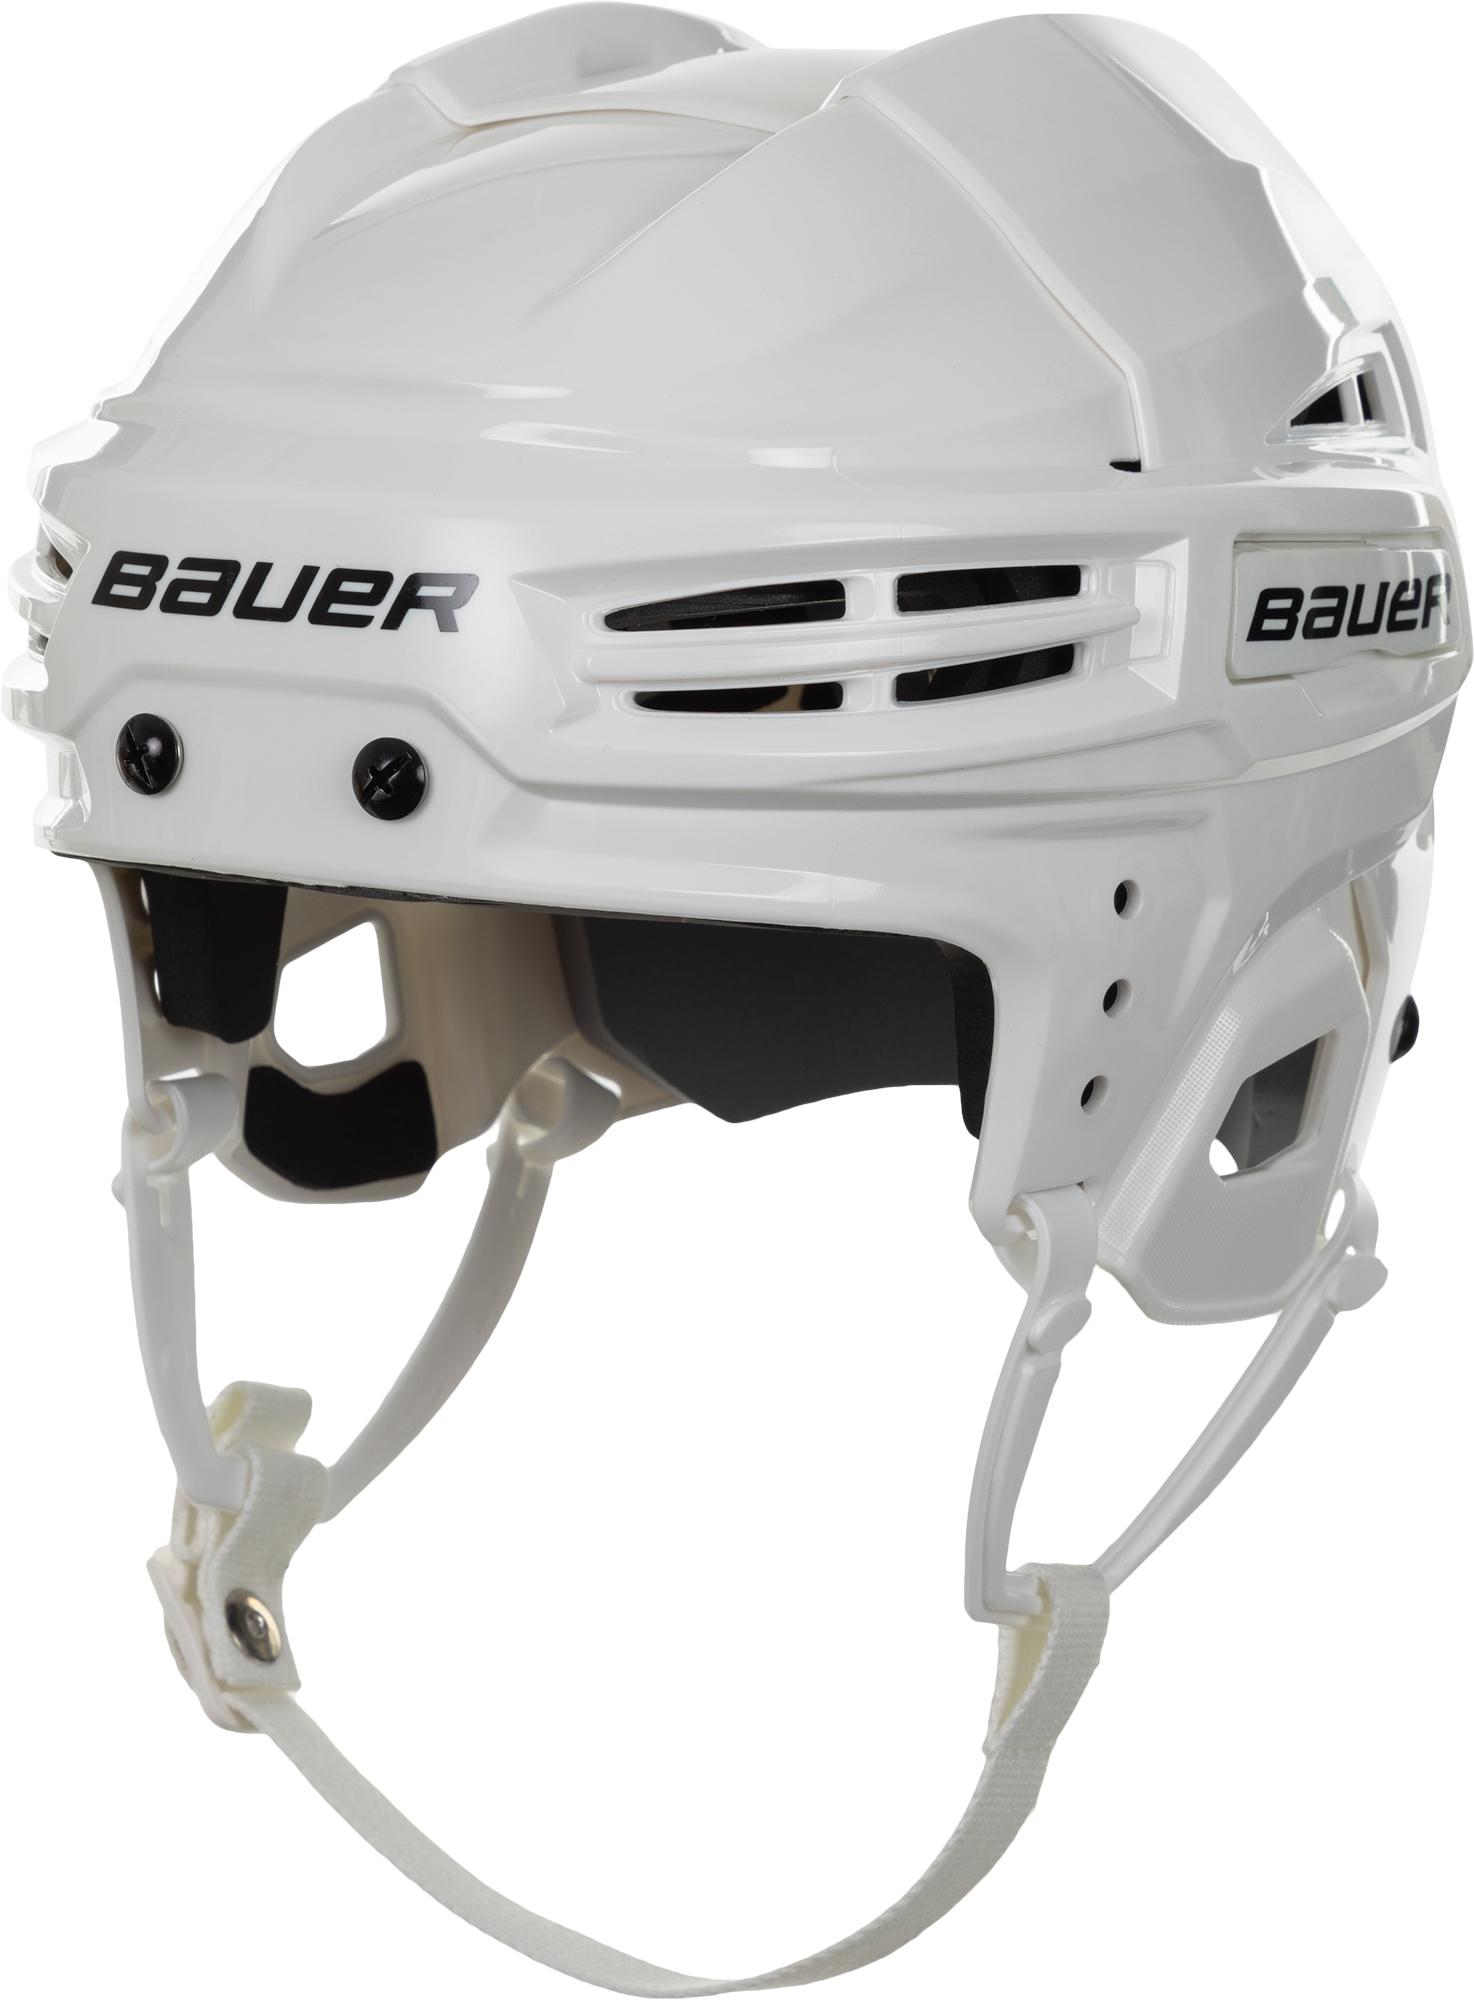 Bauer Шлем хоккейный IMS 5.0